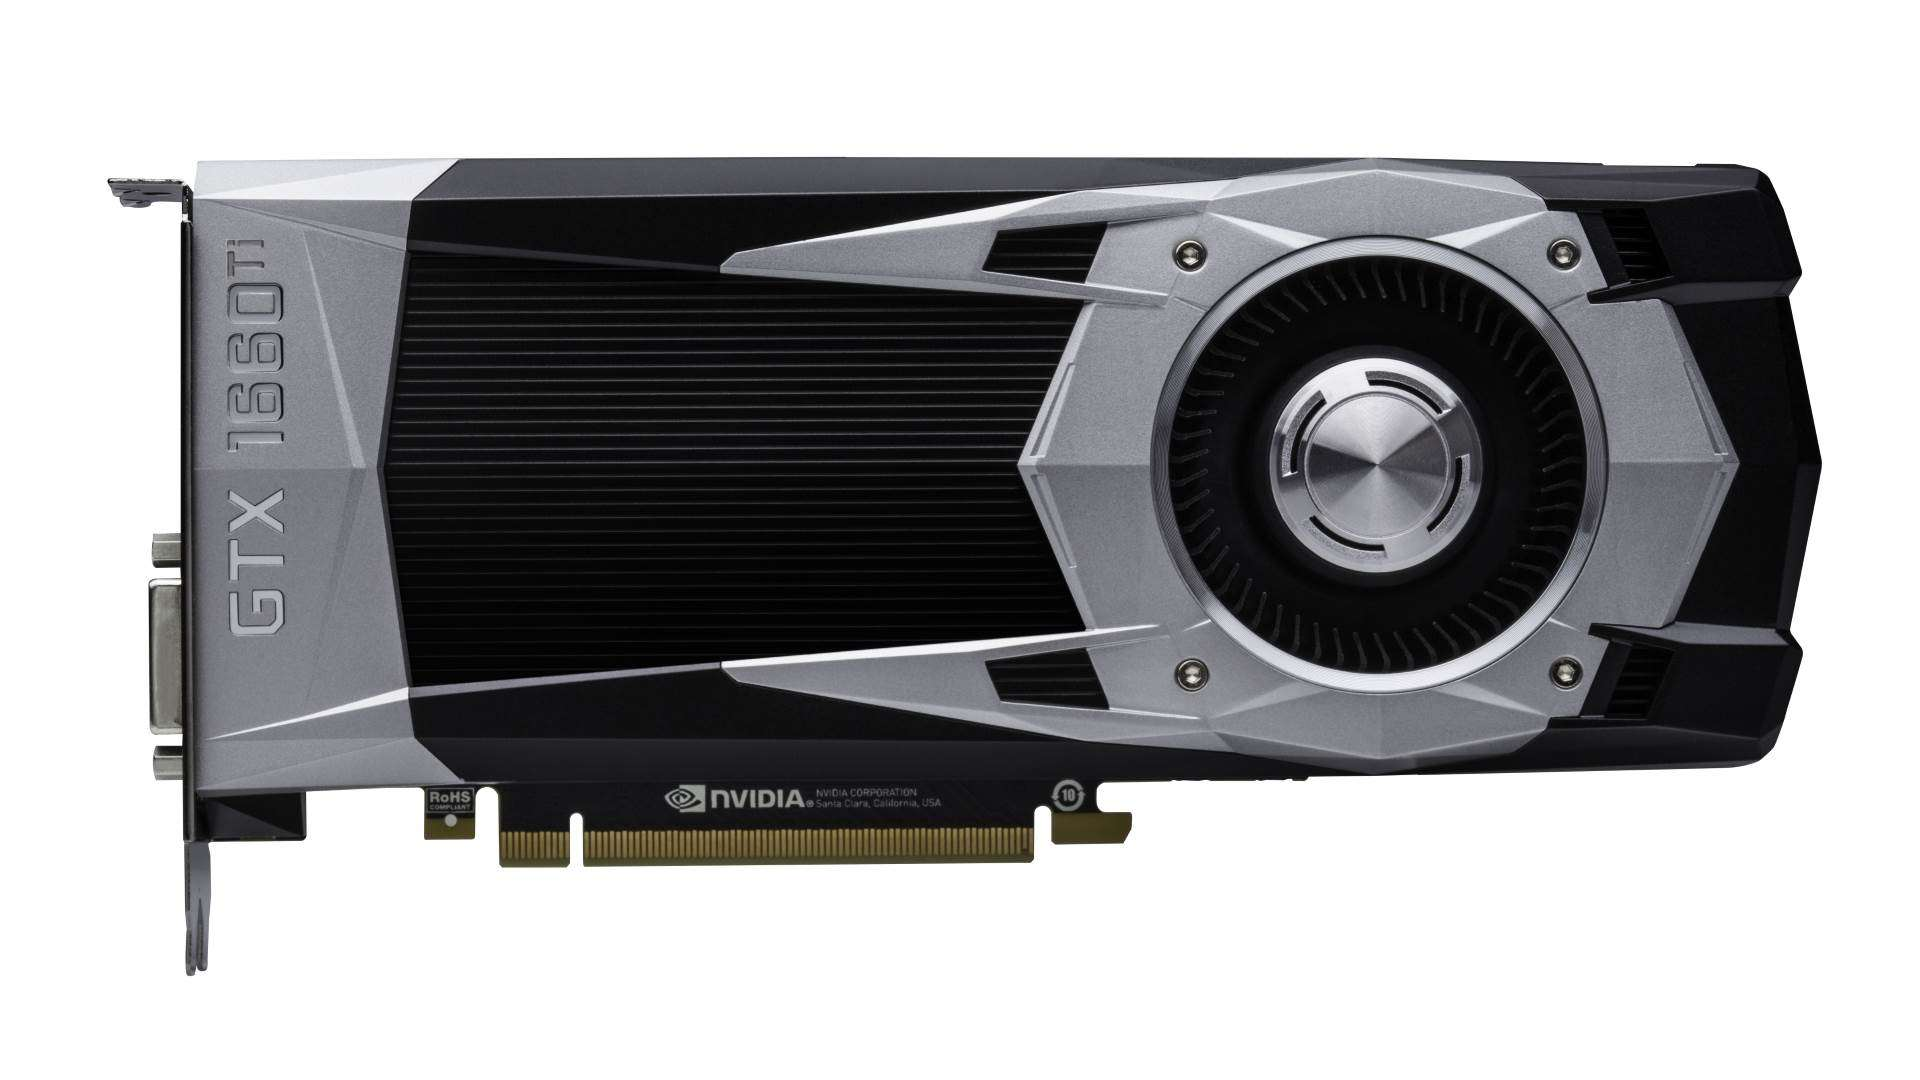 Nvidia GTX 1660 Ti 3DMark benchmarks place it ahead of the